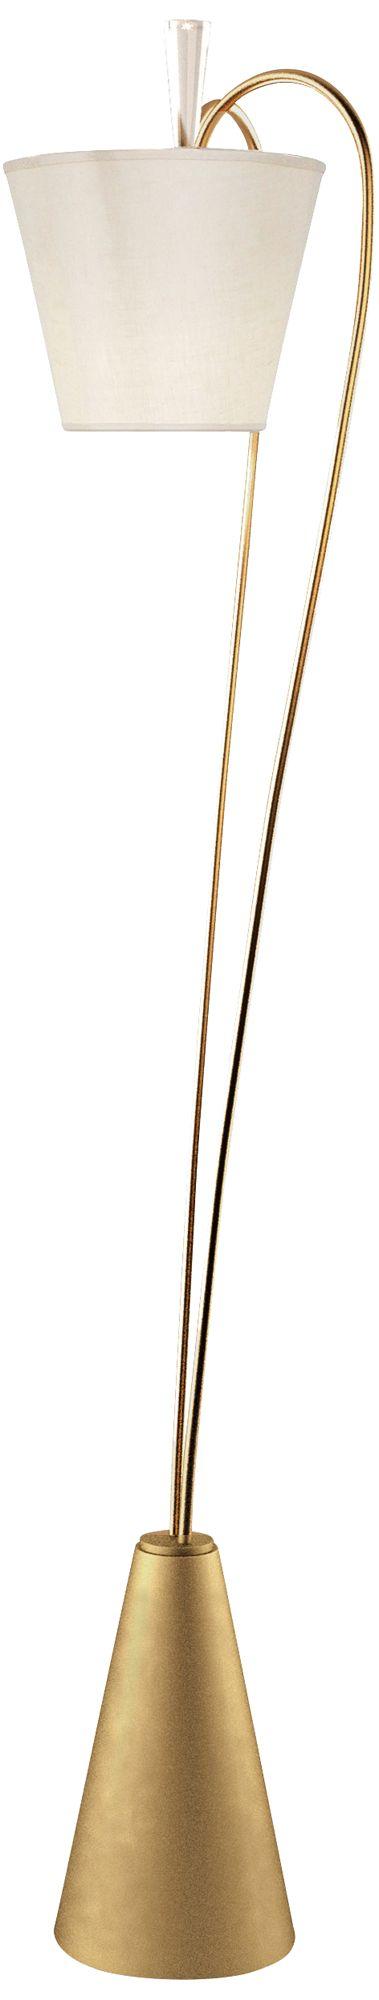 Van Teal Up Lift Sienna Gold LED Floor Lamp